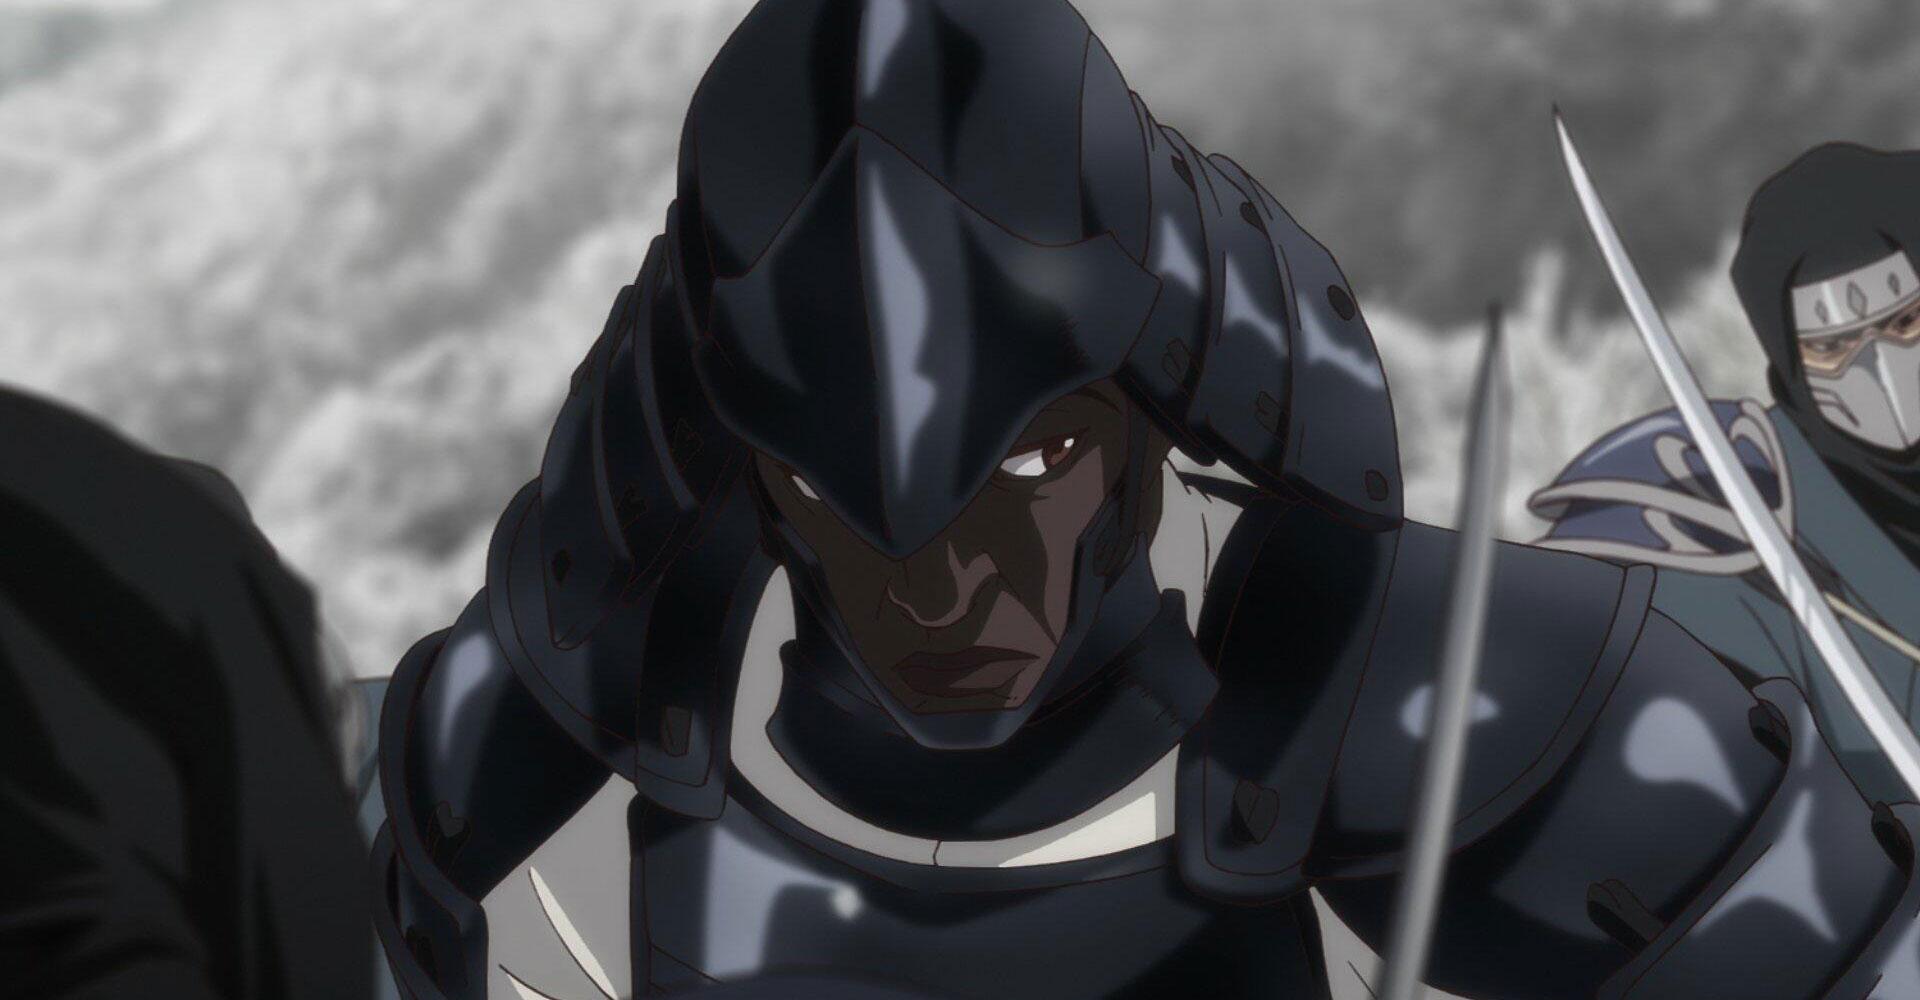 Szenenbild aus der Netflix-Anime-Serie Yasuke